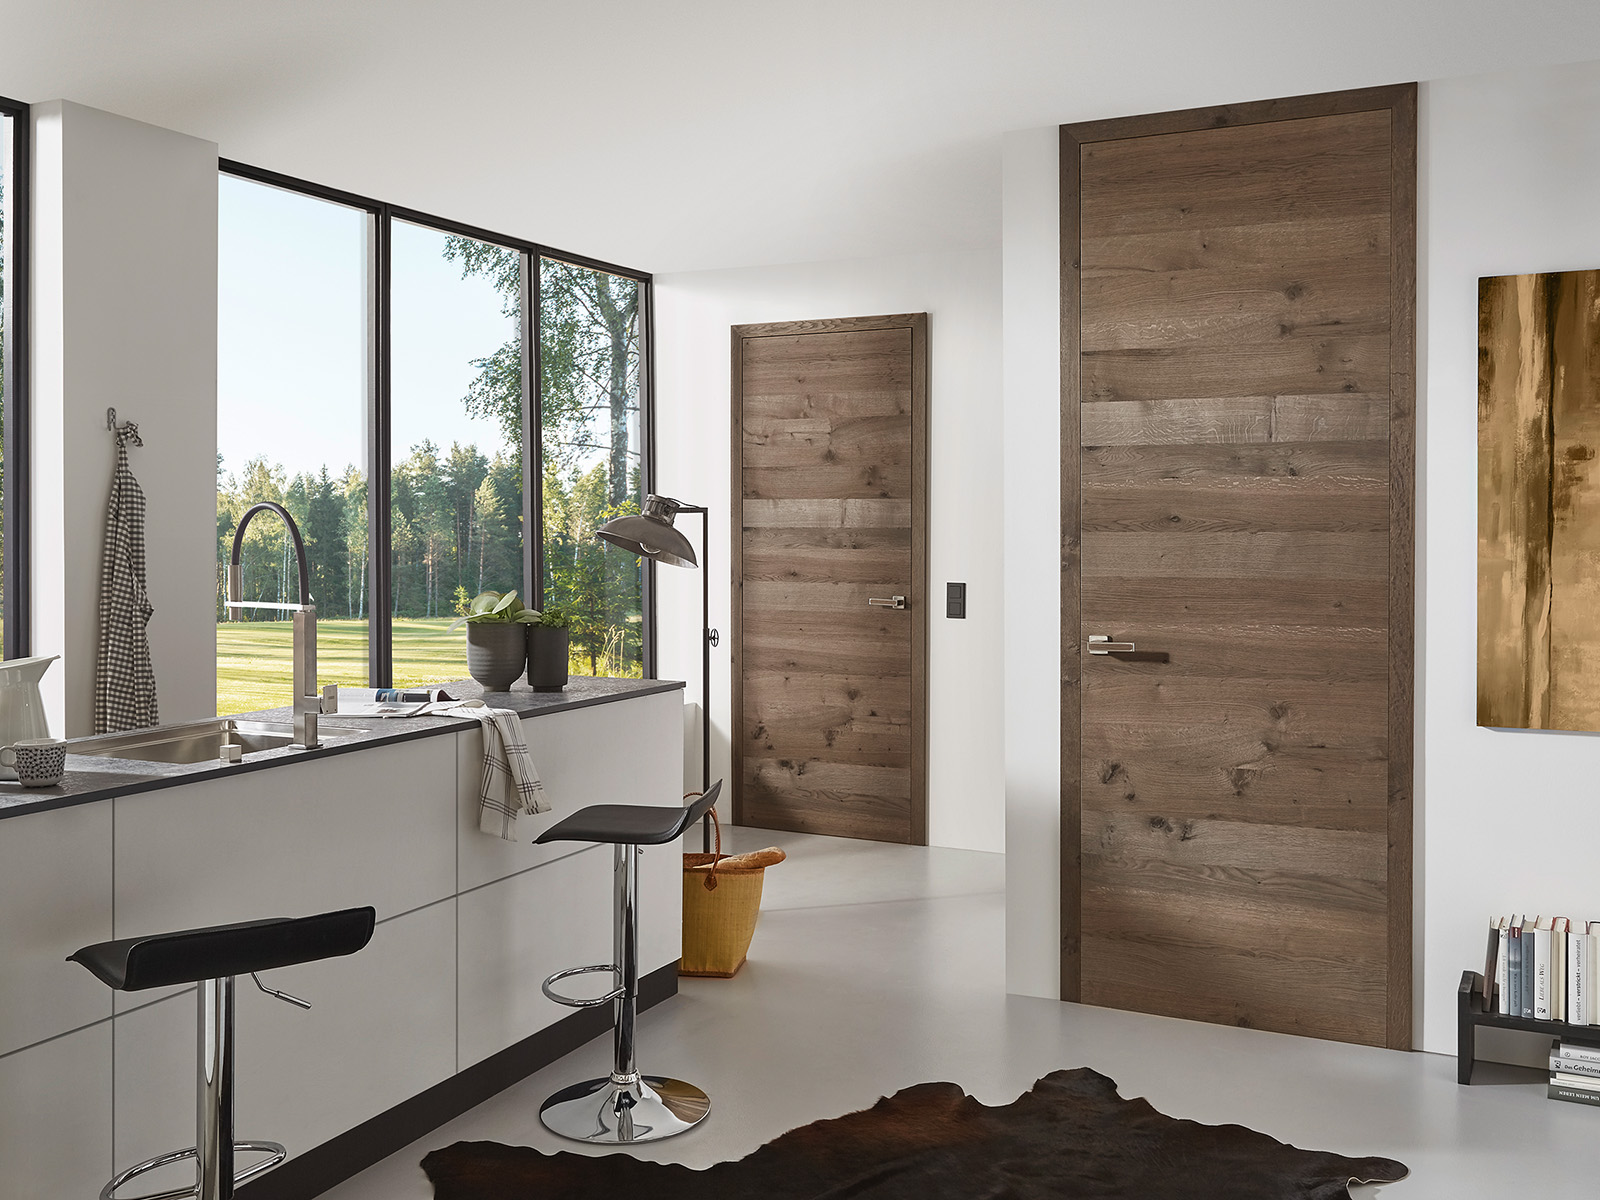 wir sind gern zuhause grauthoff t rengruppe. Black Bedroom Furniture Sets. Home Design Ideas